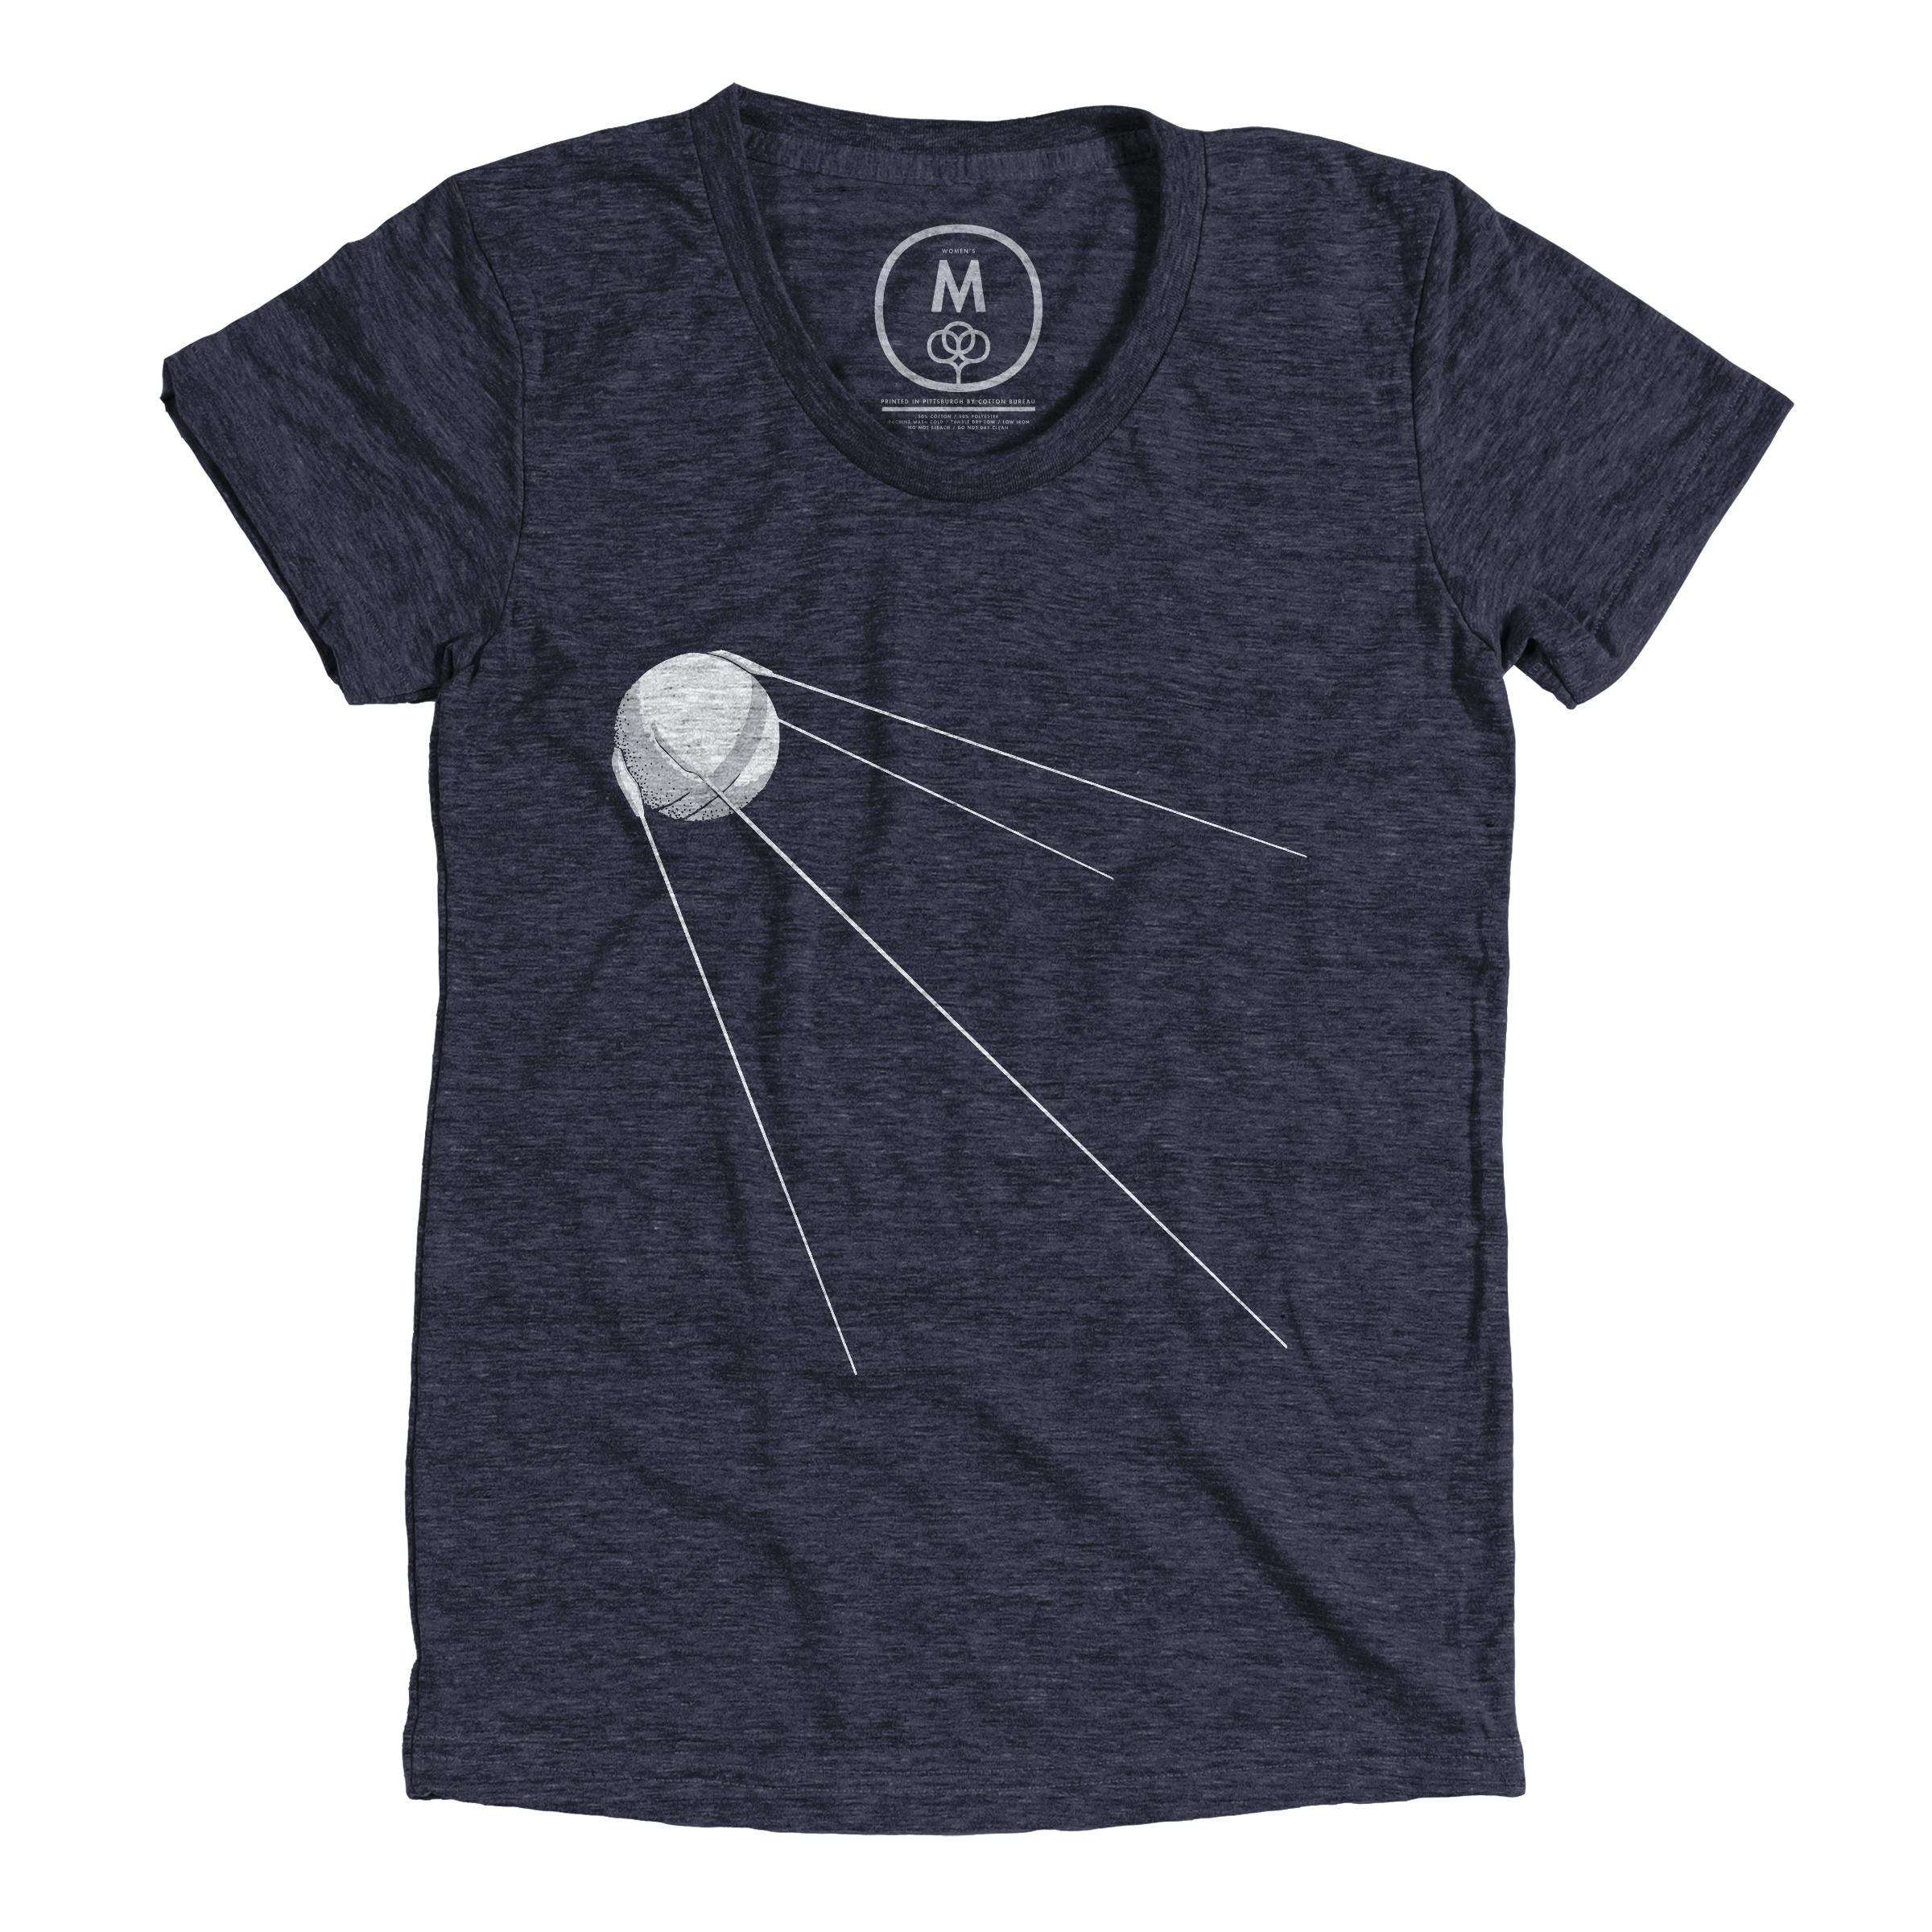 Sputnik 1 Vintage Navy (Women's)